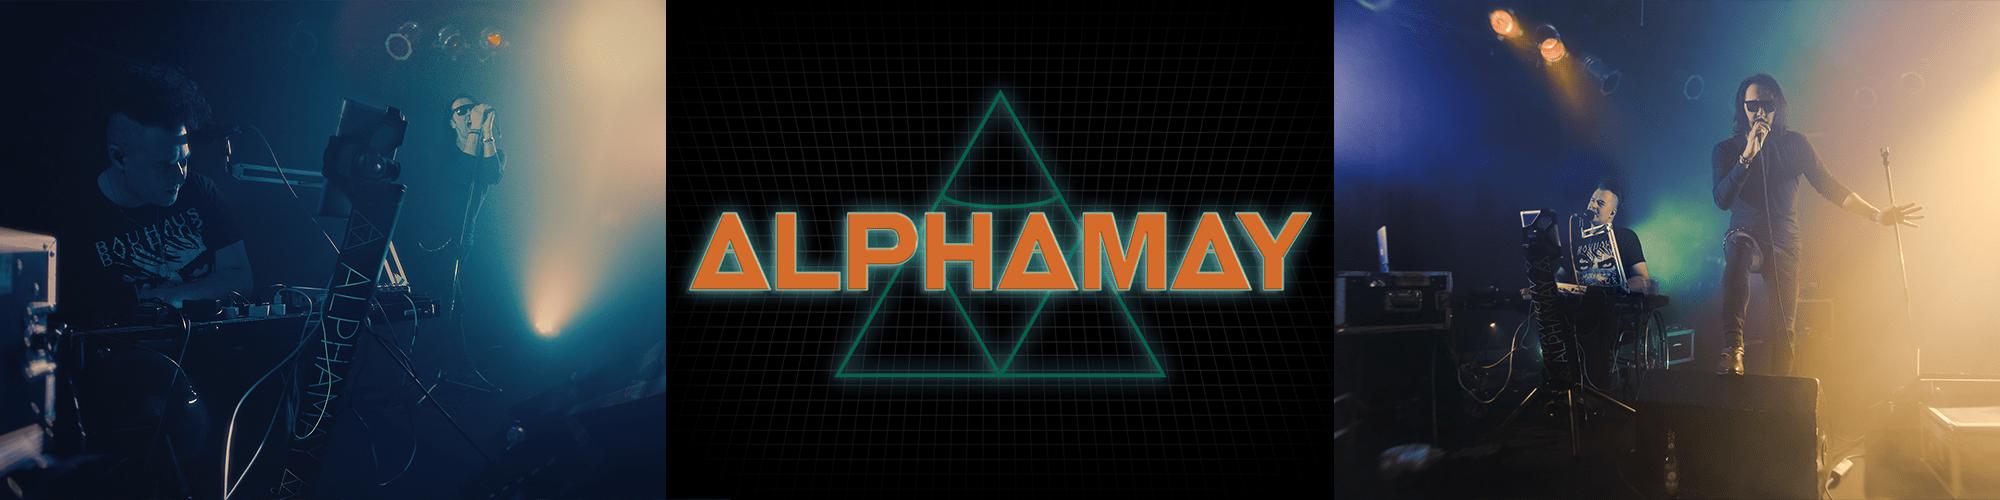 Alphamay